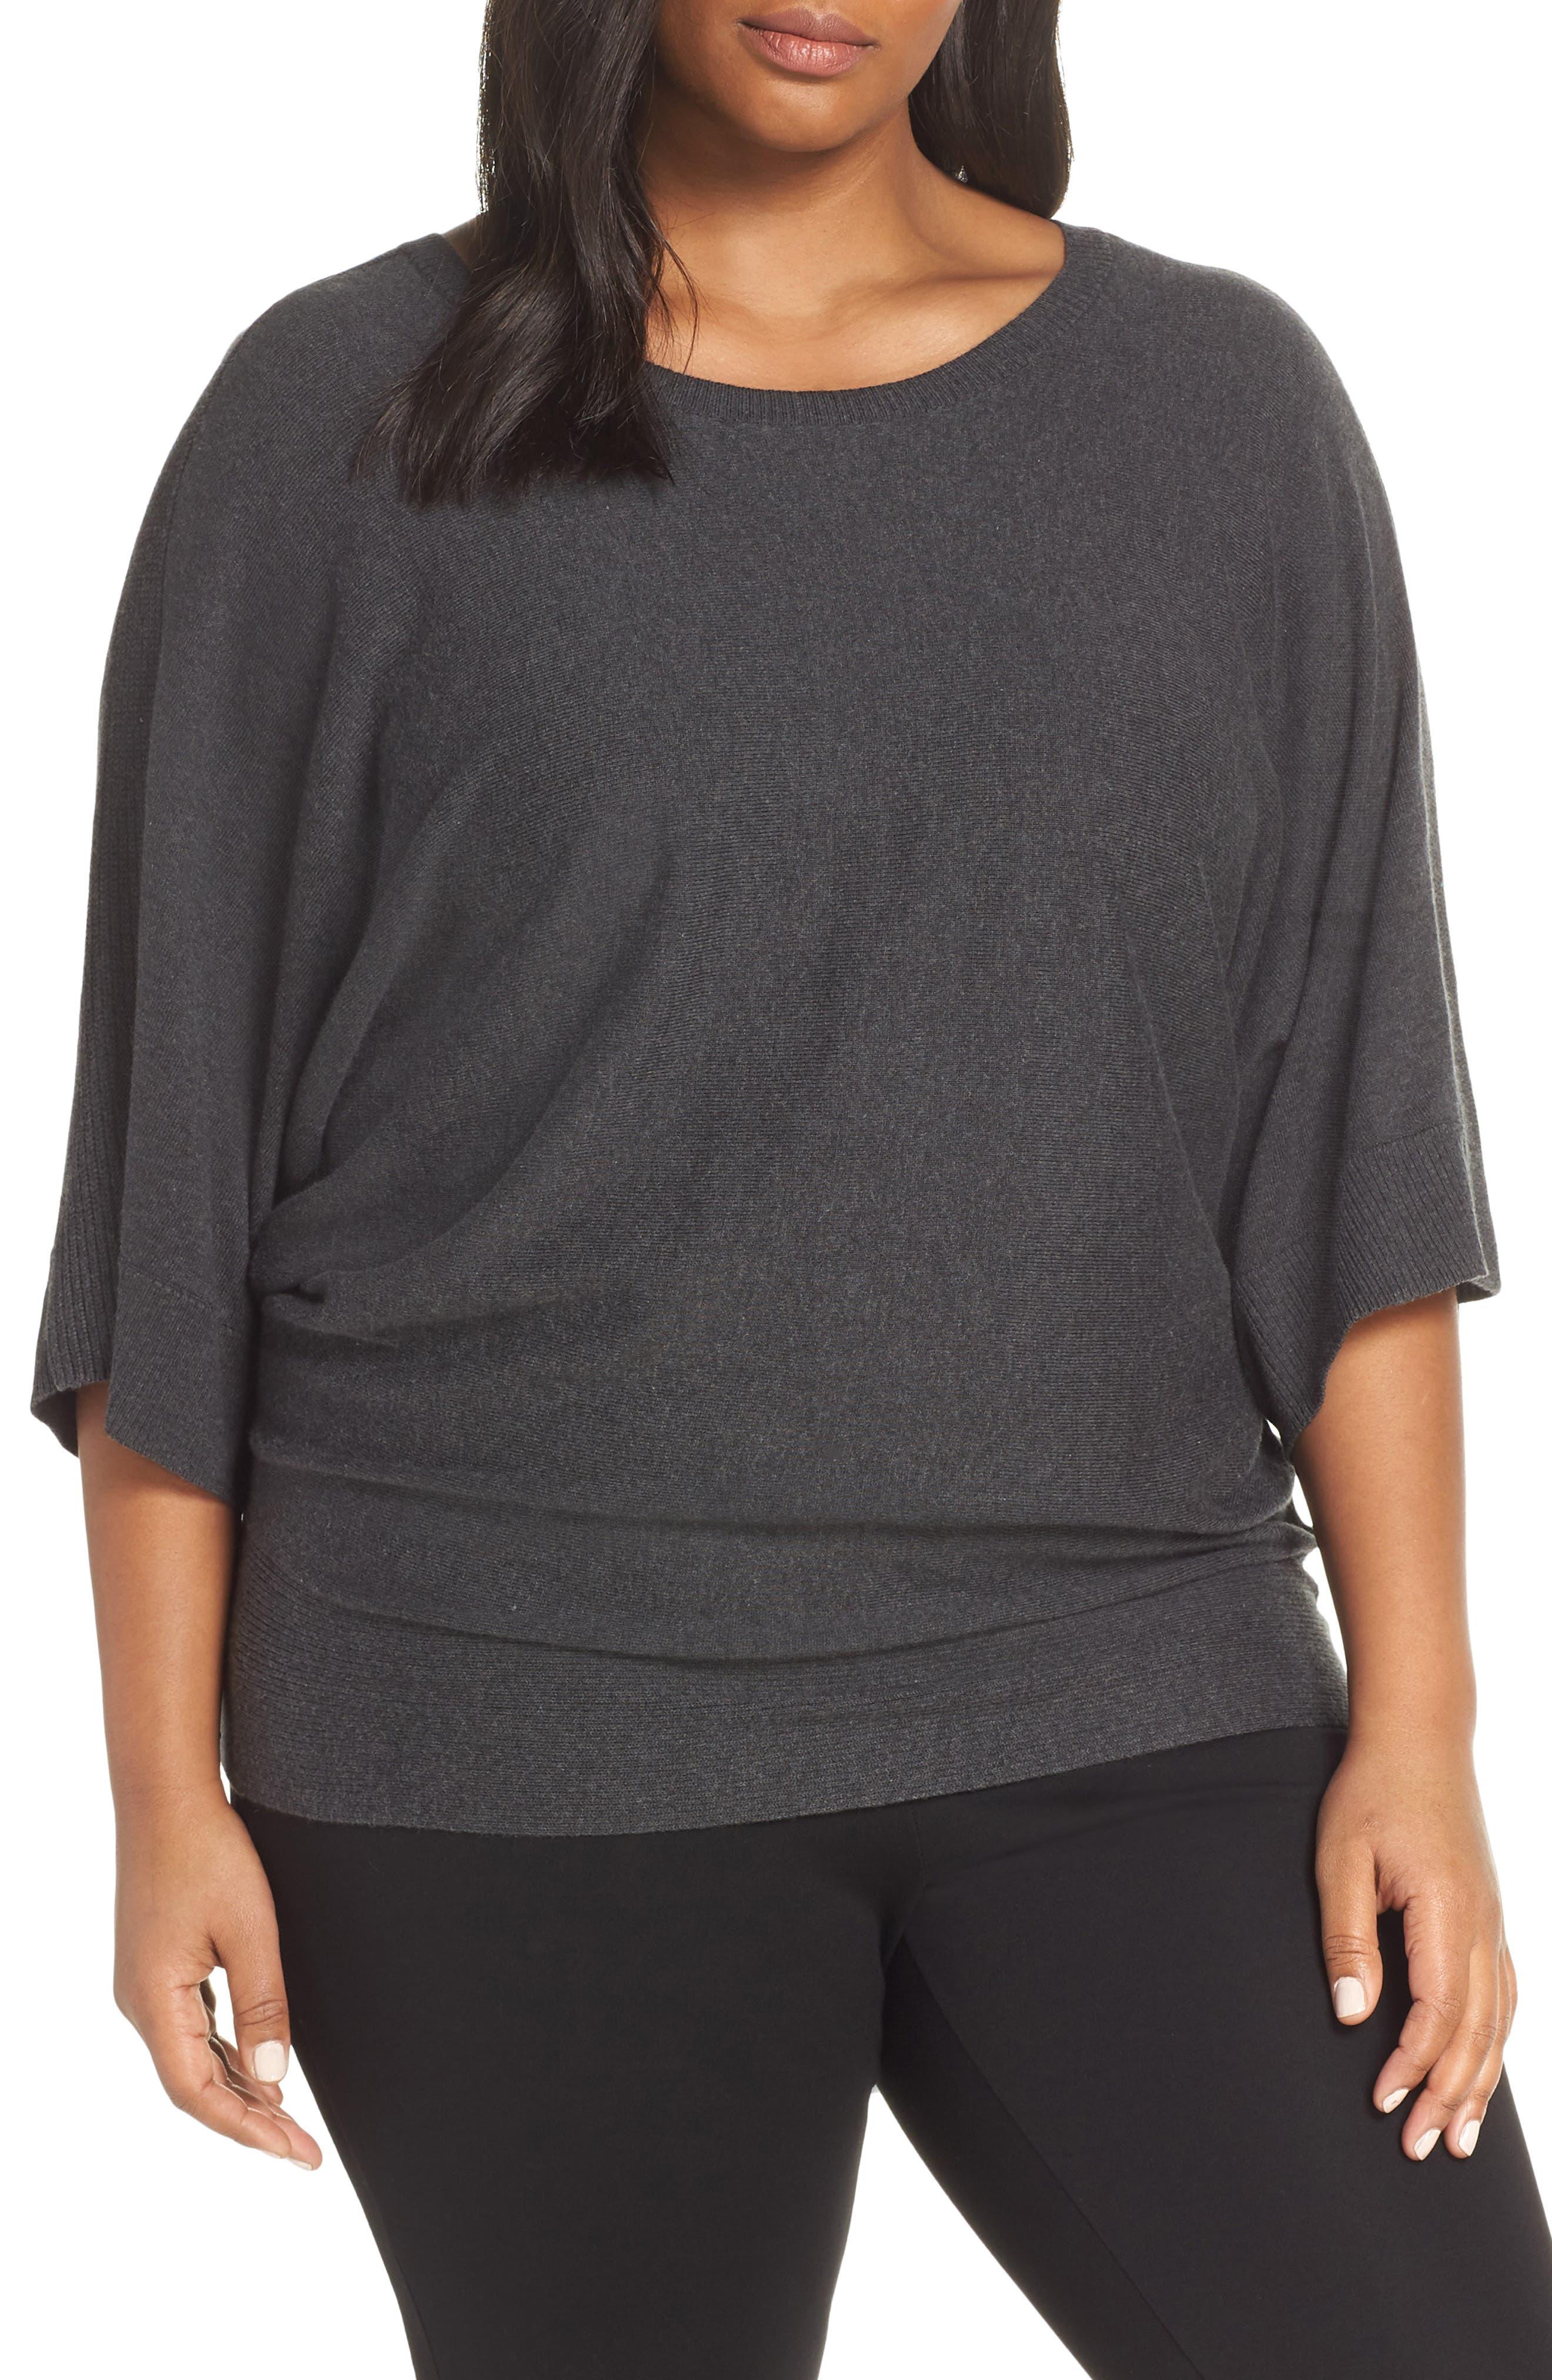 Cotton Blend Kimono Sweater,                         Main,                         color, GREY DARK CHARCOAL HEATHER